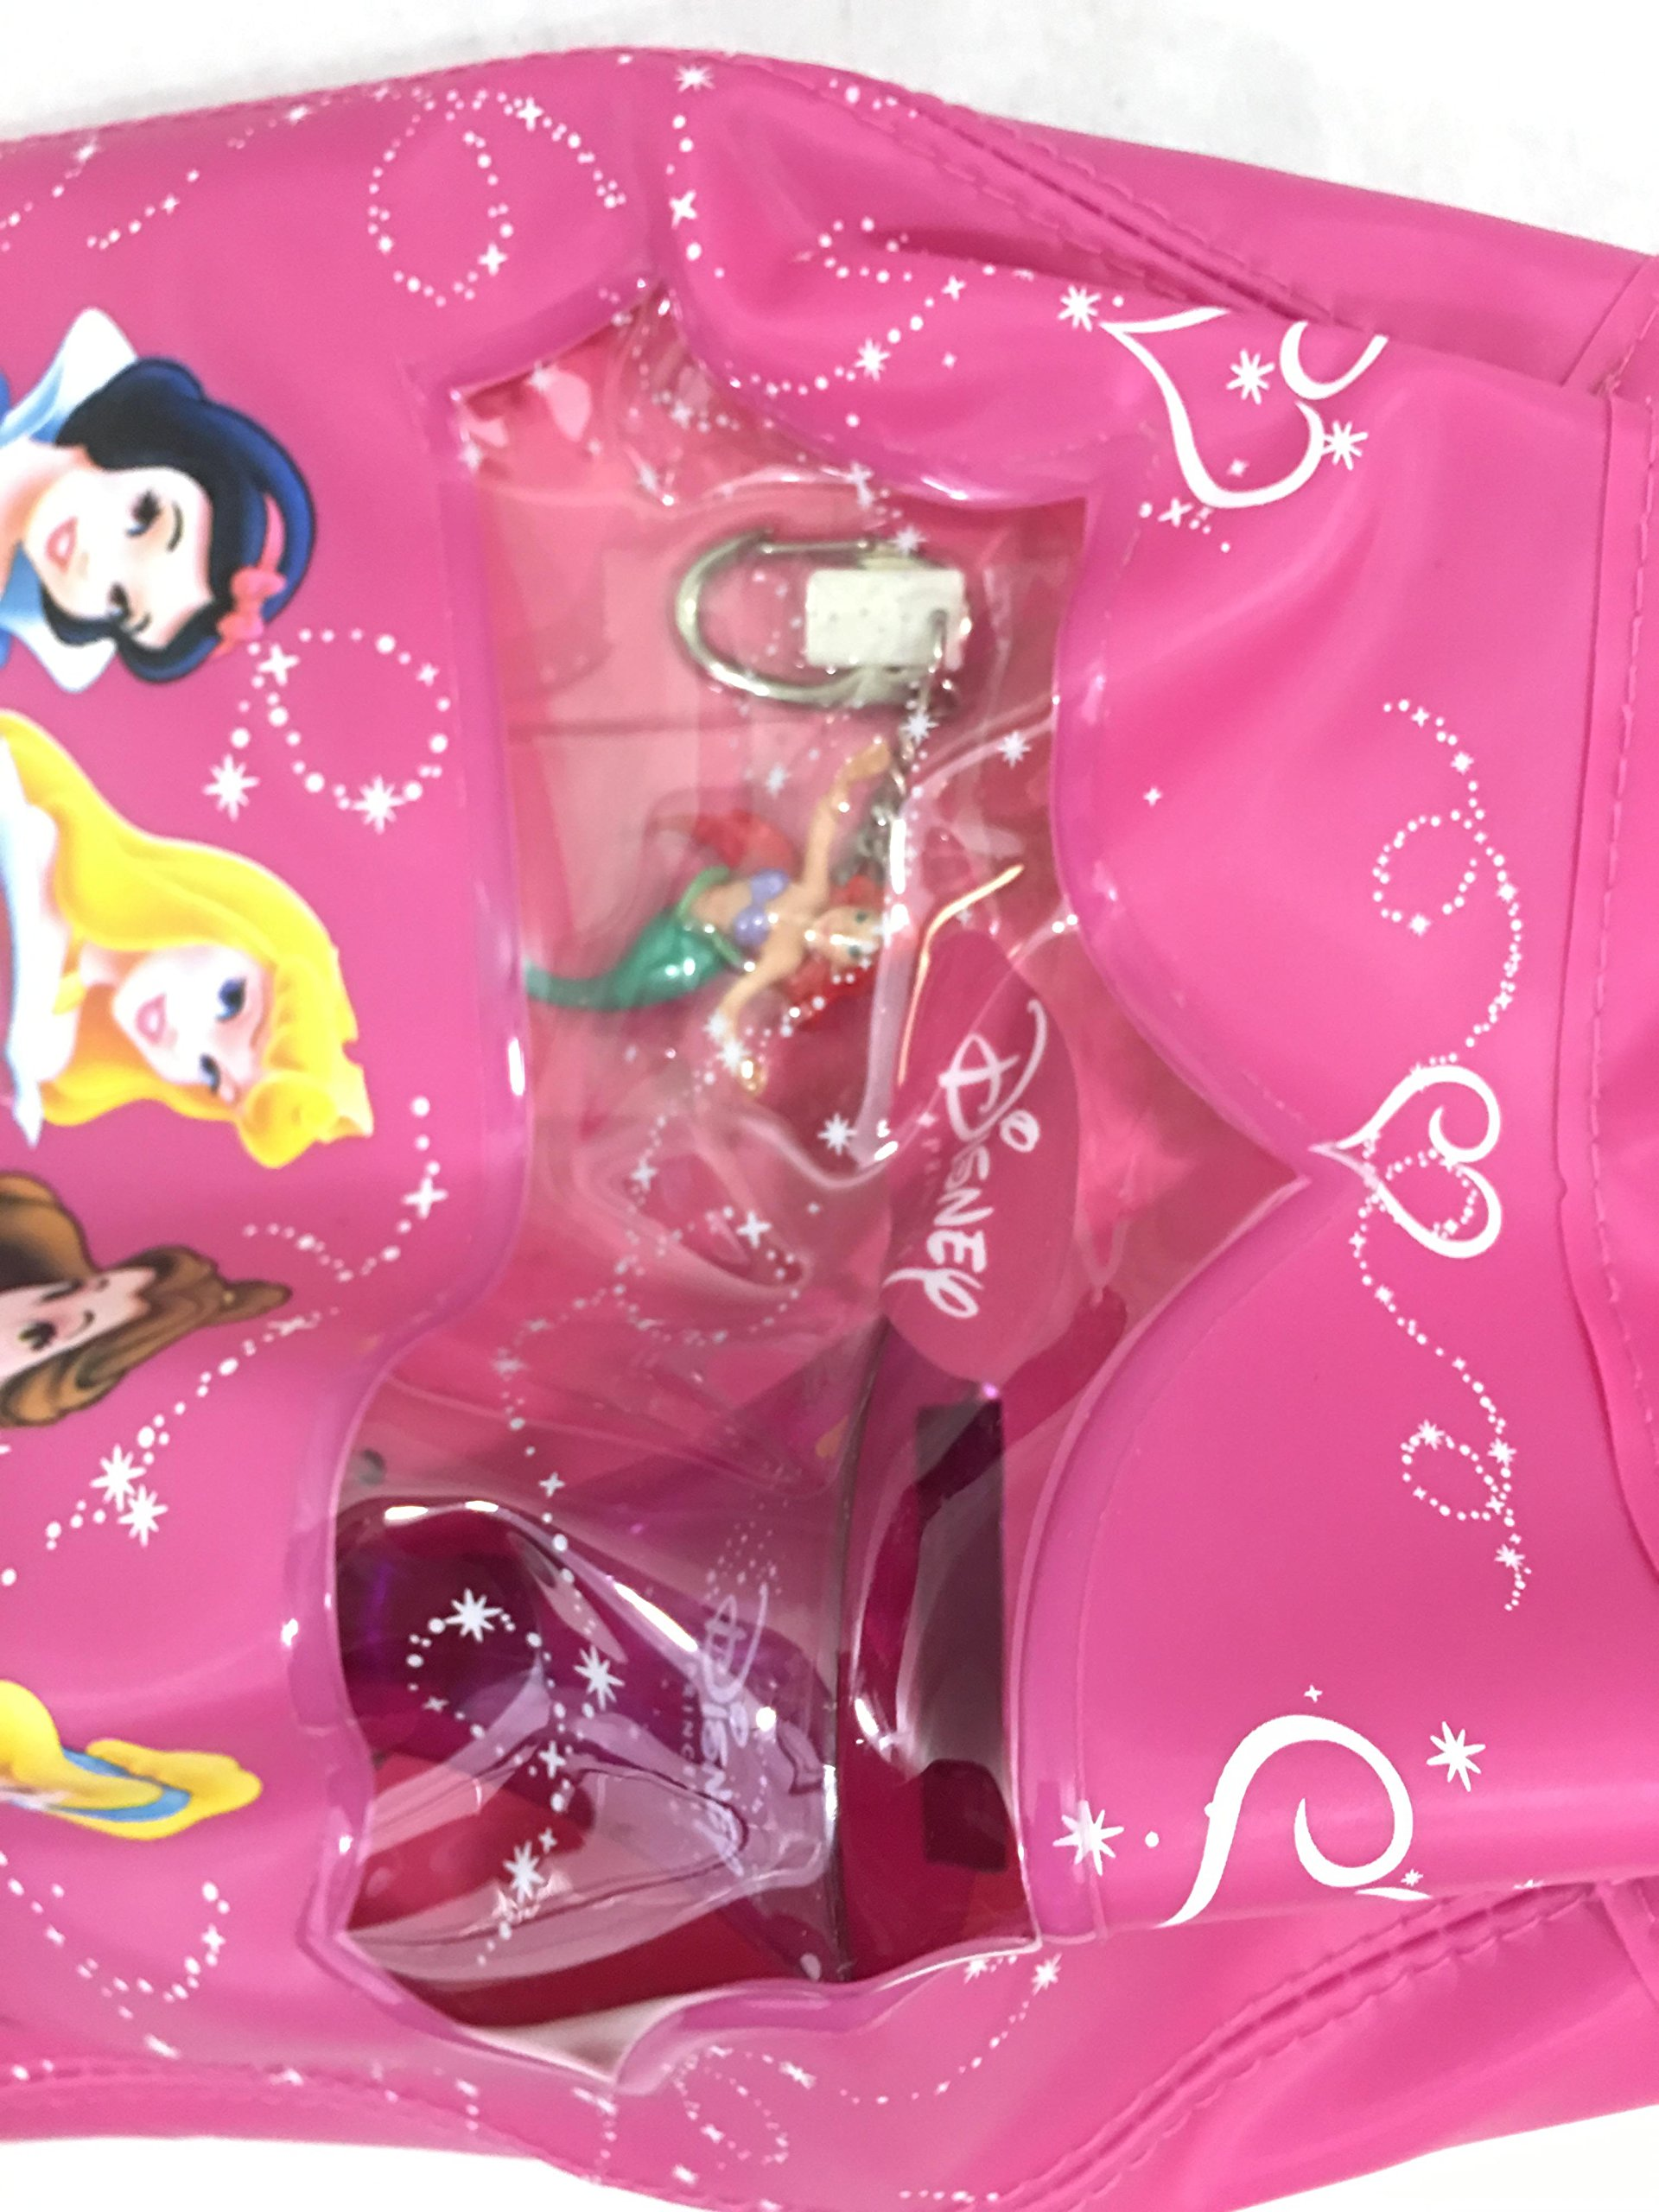 Disney Princess Bicycle Gear Set Bike Lock Pink Horn & Shoulder Bag